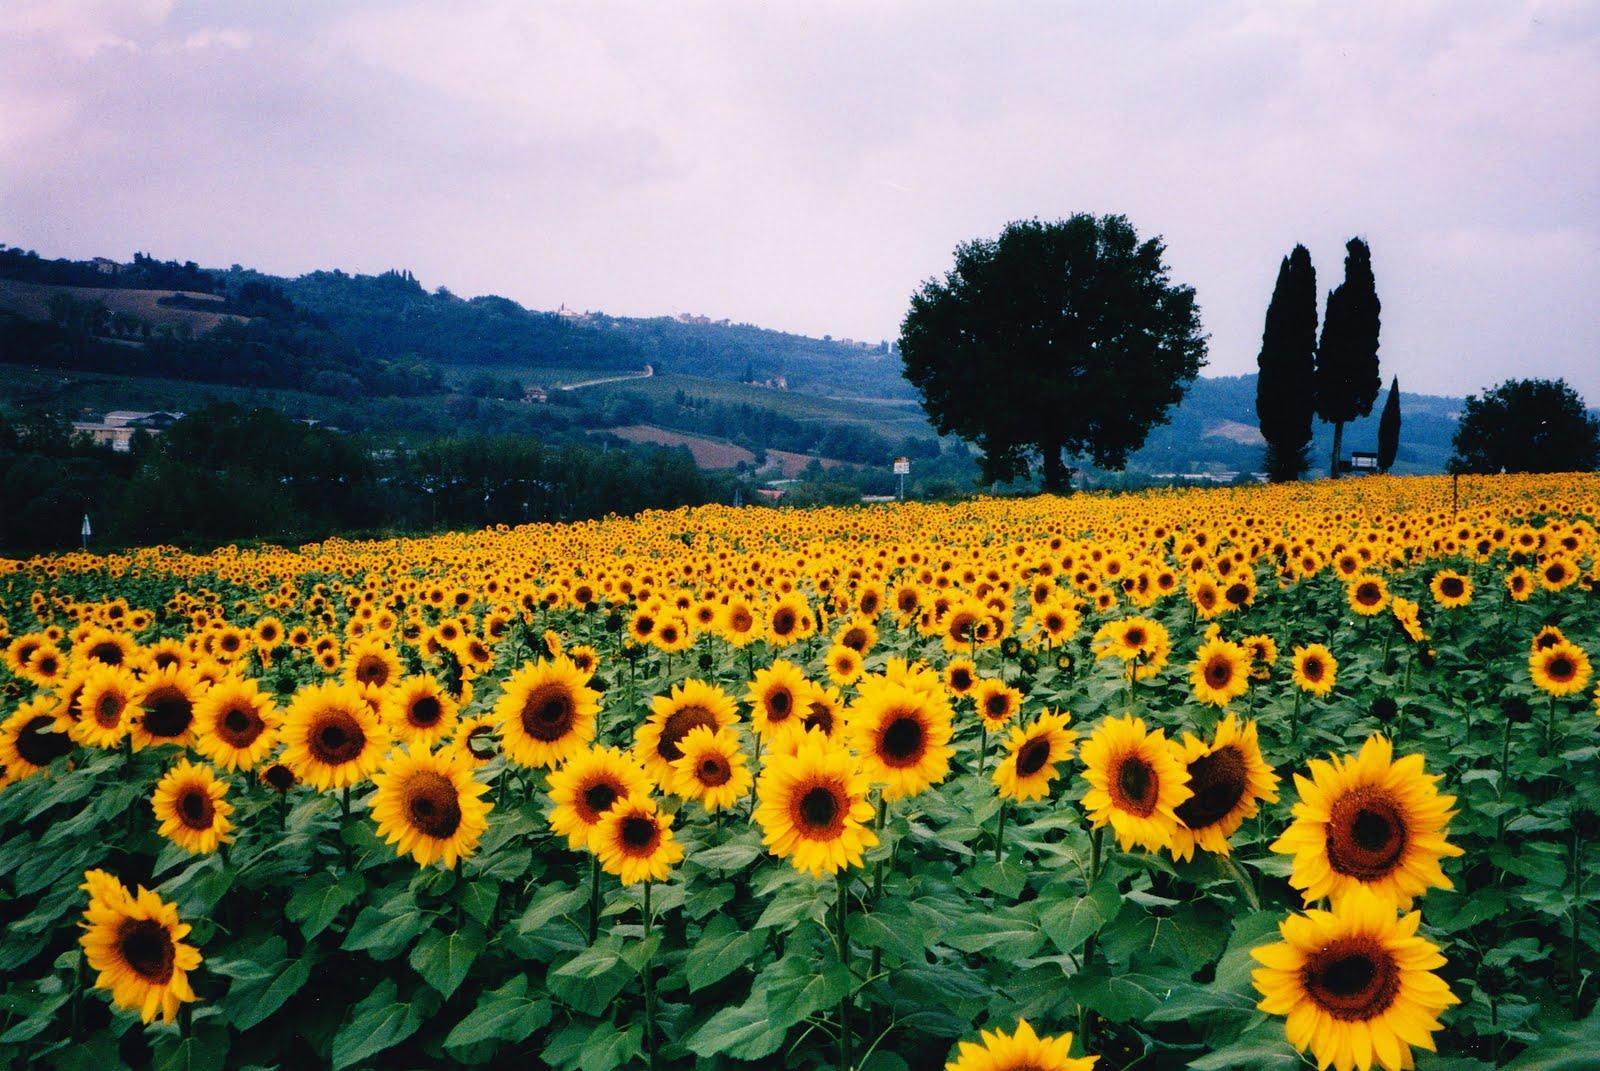 Chèvrefeuille's haiku-blog: Sunflower